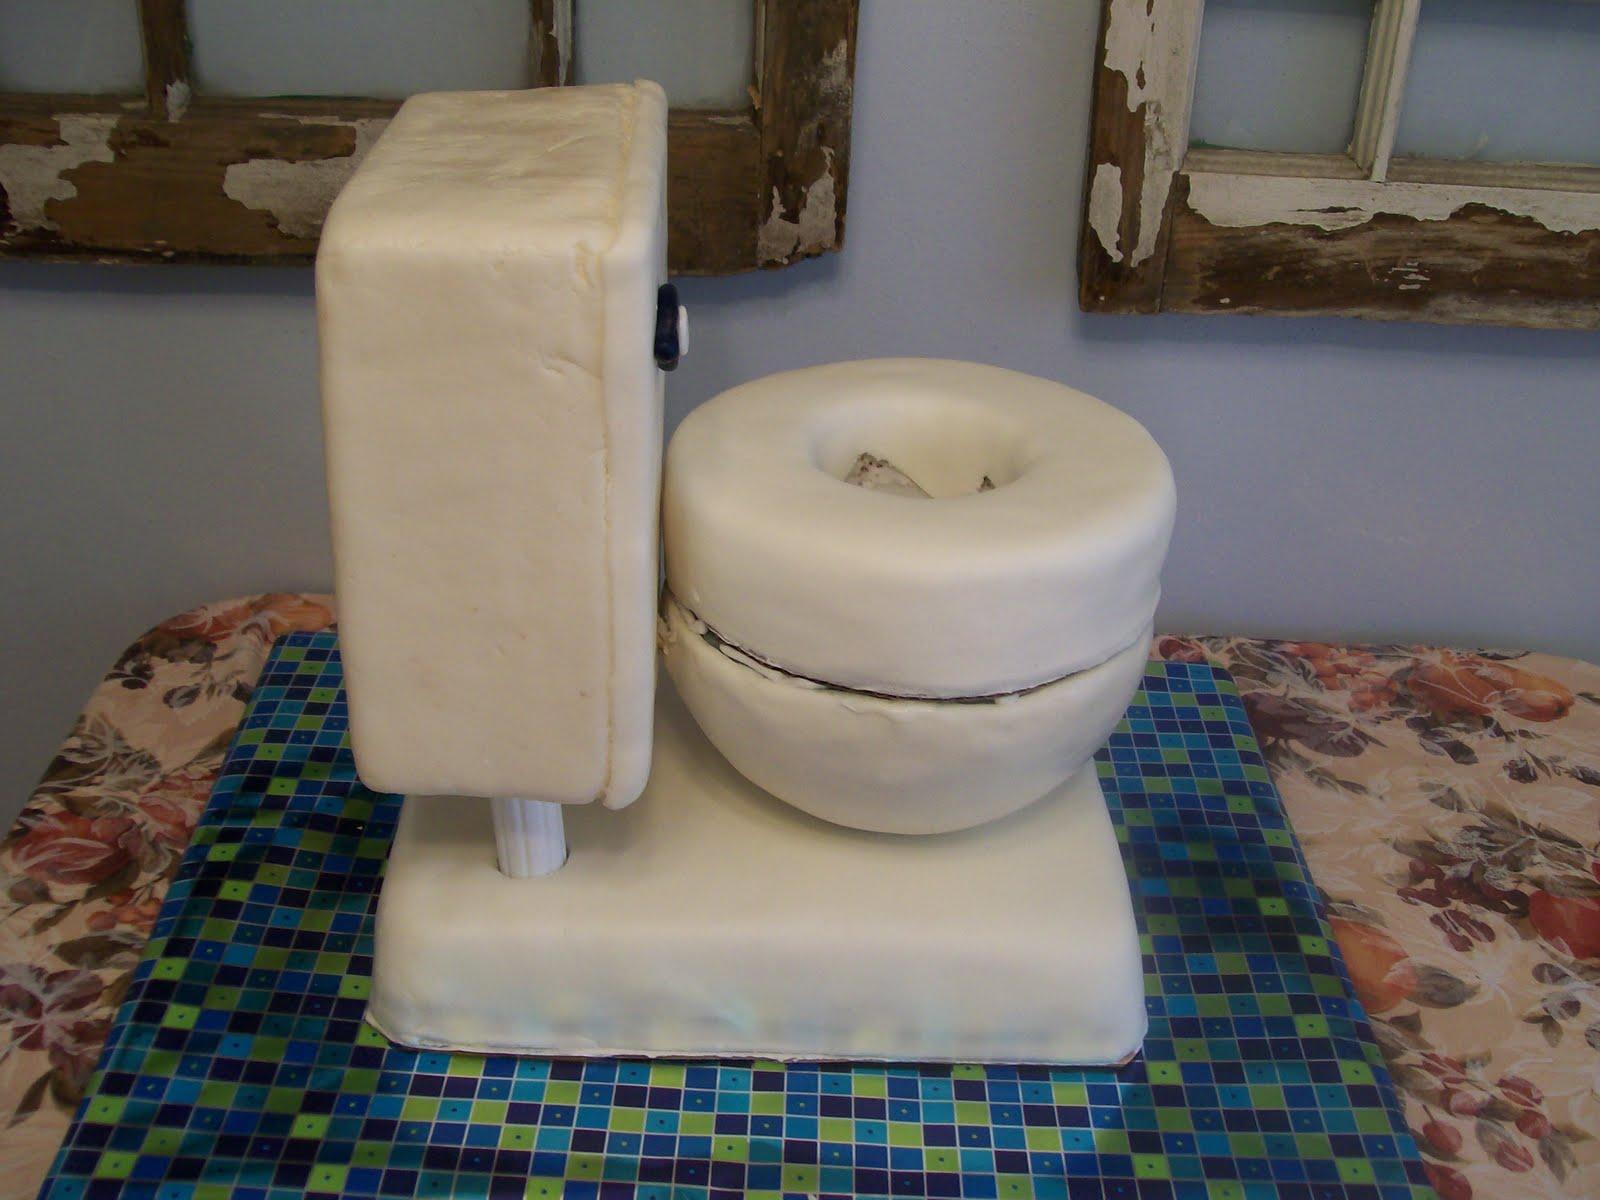 Let Them Eat Cake!: Toilet Cake